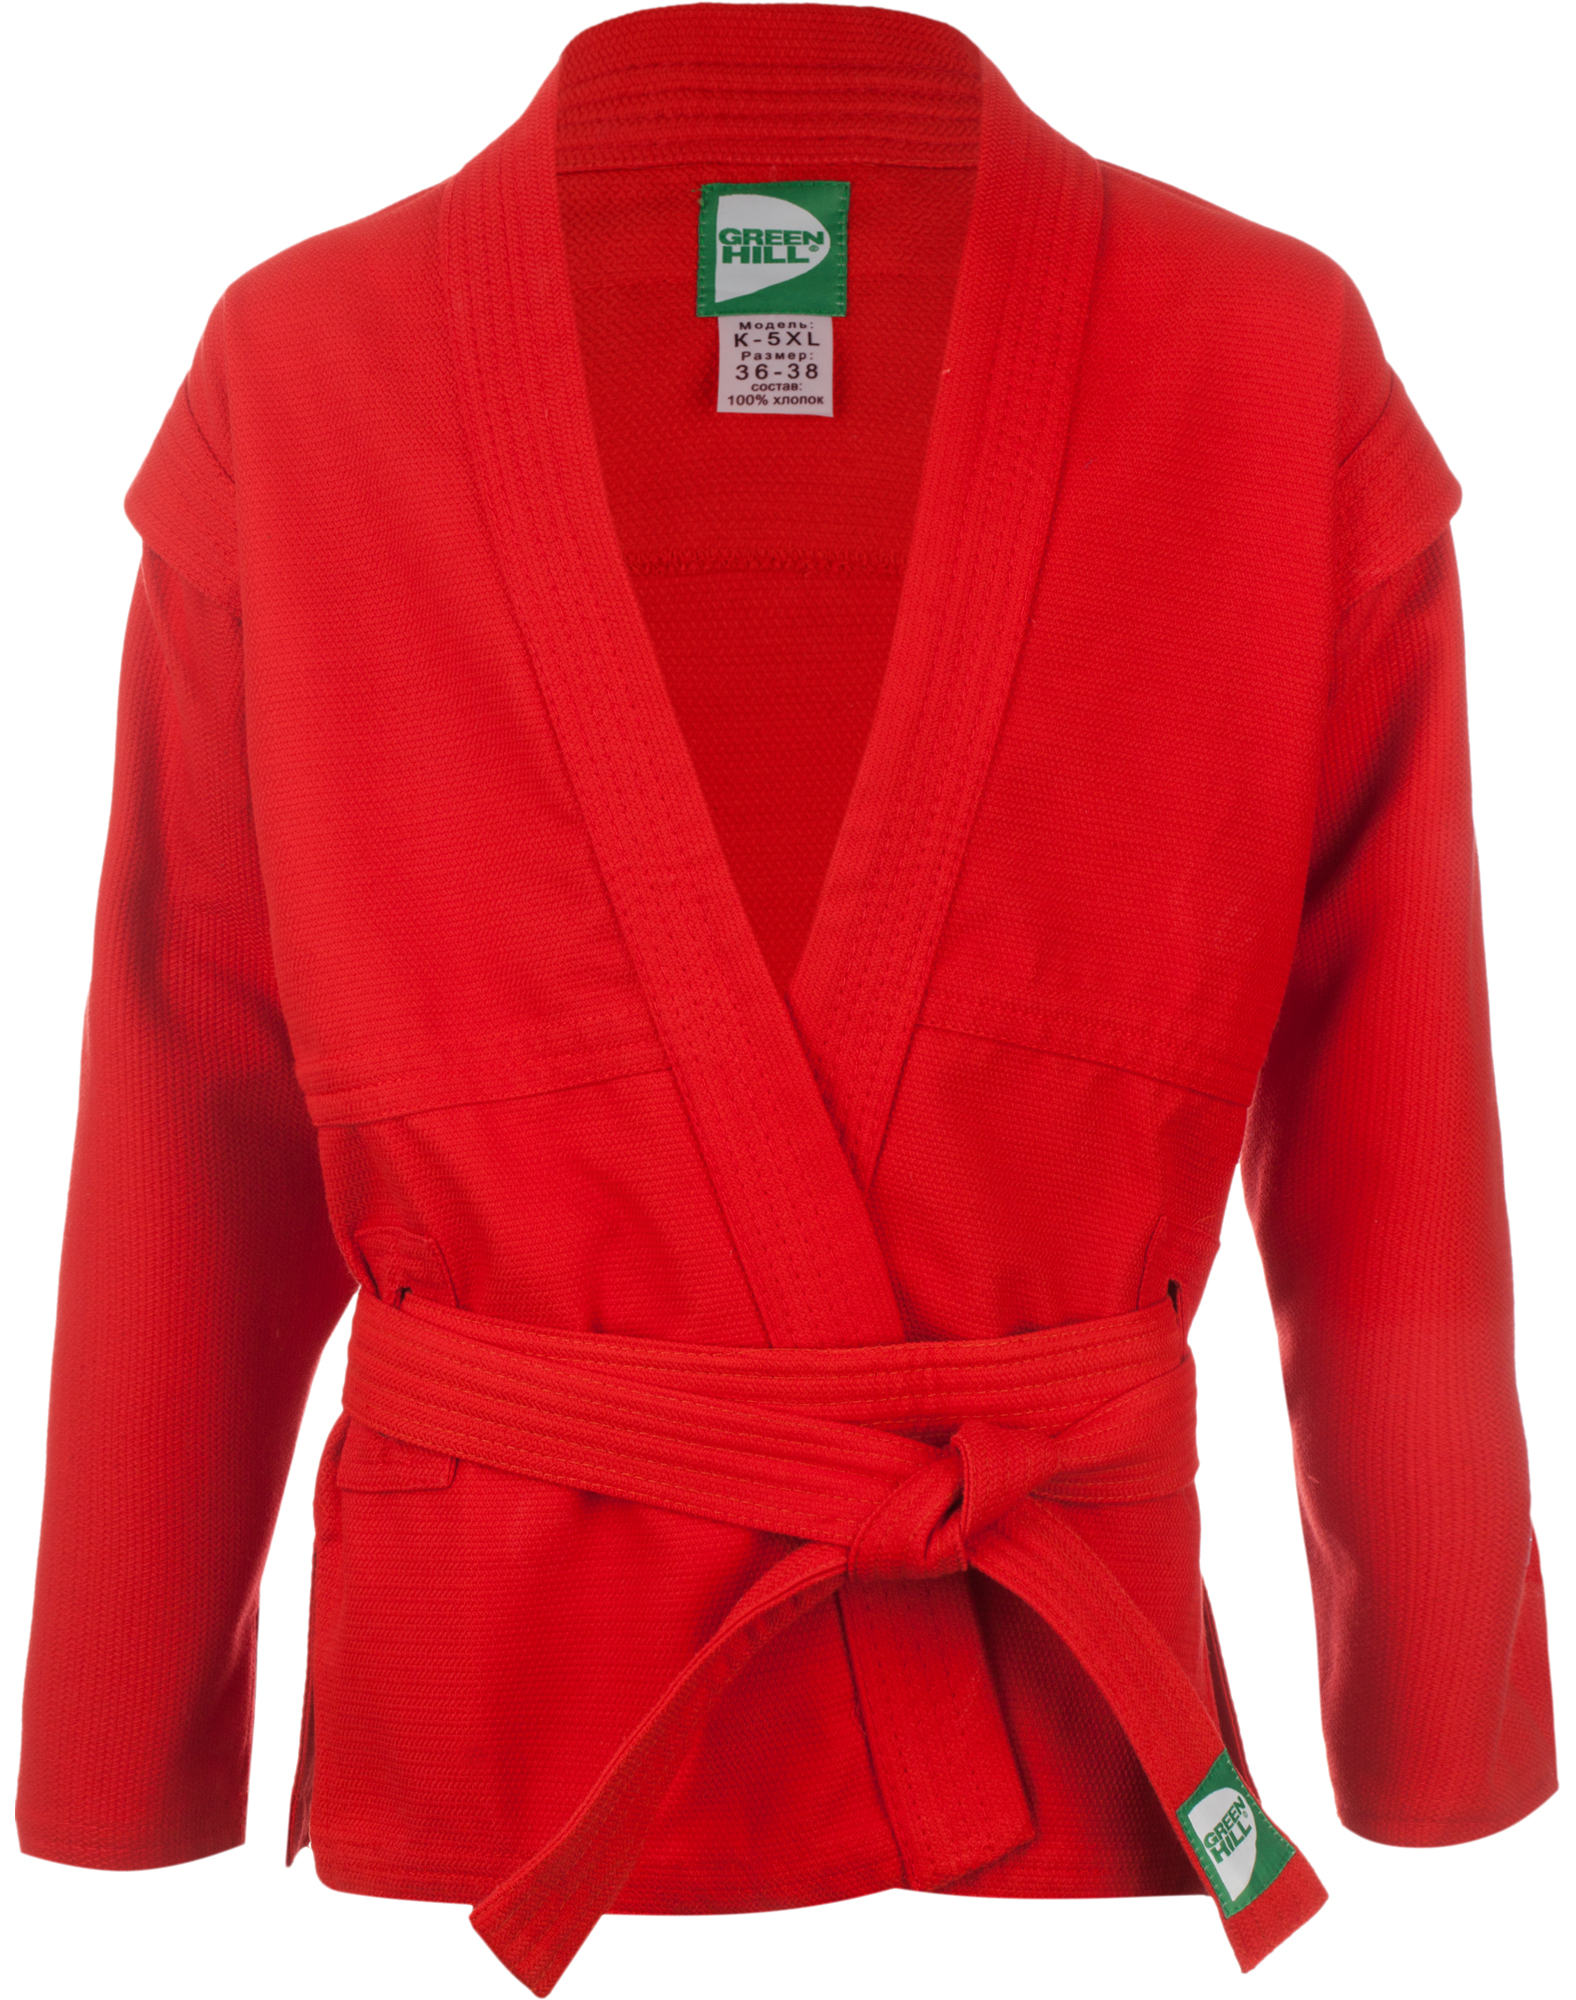 Green Hill Куртка для самбо Green Hill, размер 56-58